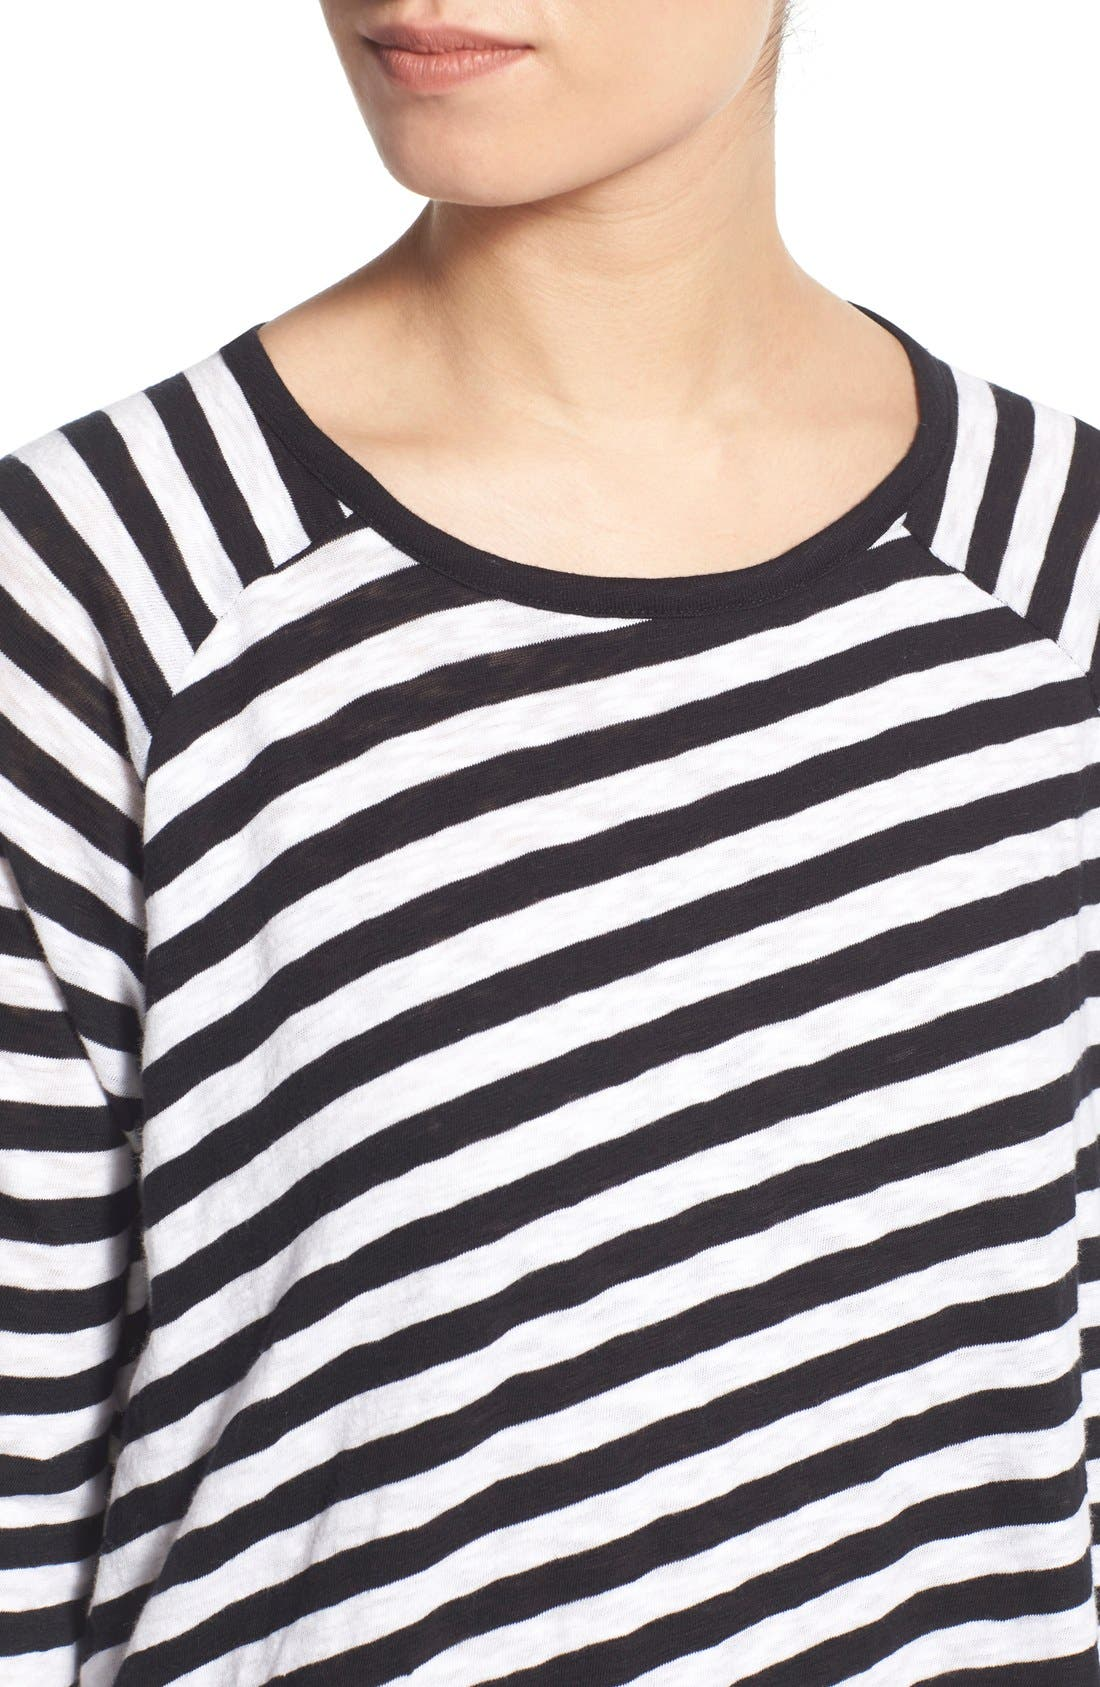 Alternate Image 4  - rag & bone/JEAN 'Camden' Stripe Long Sleeve Tee